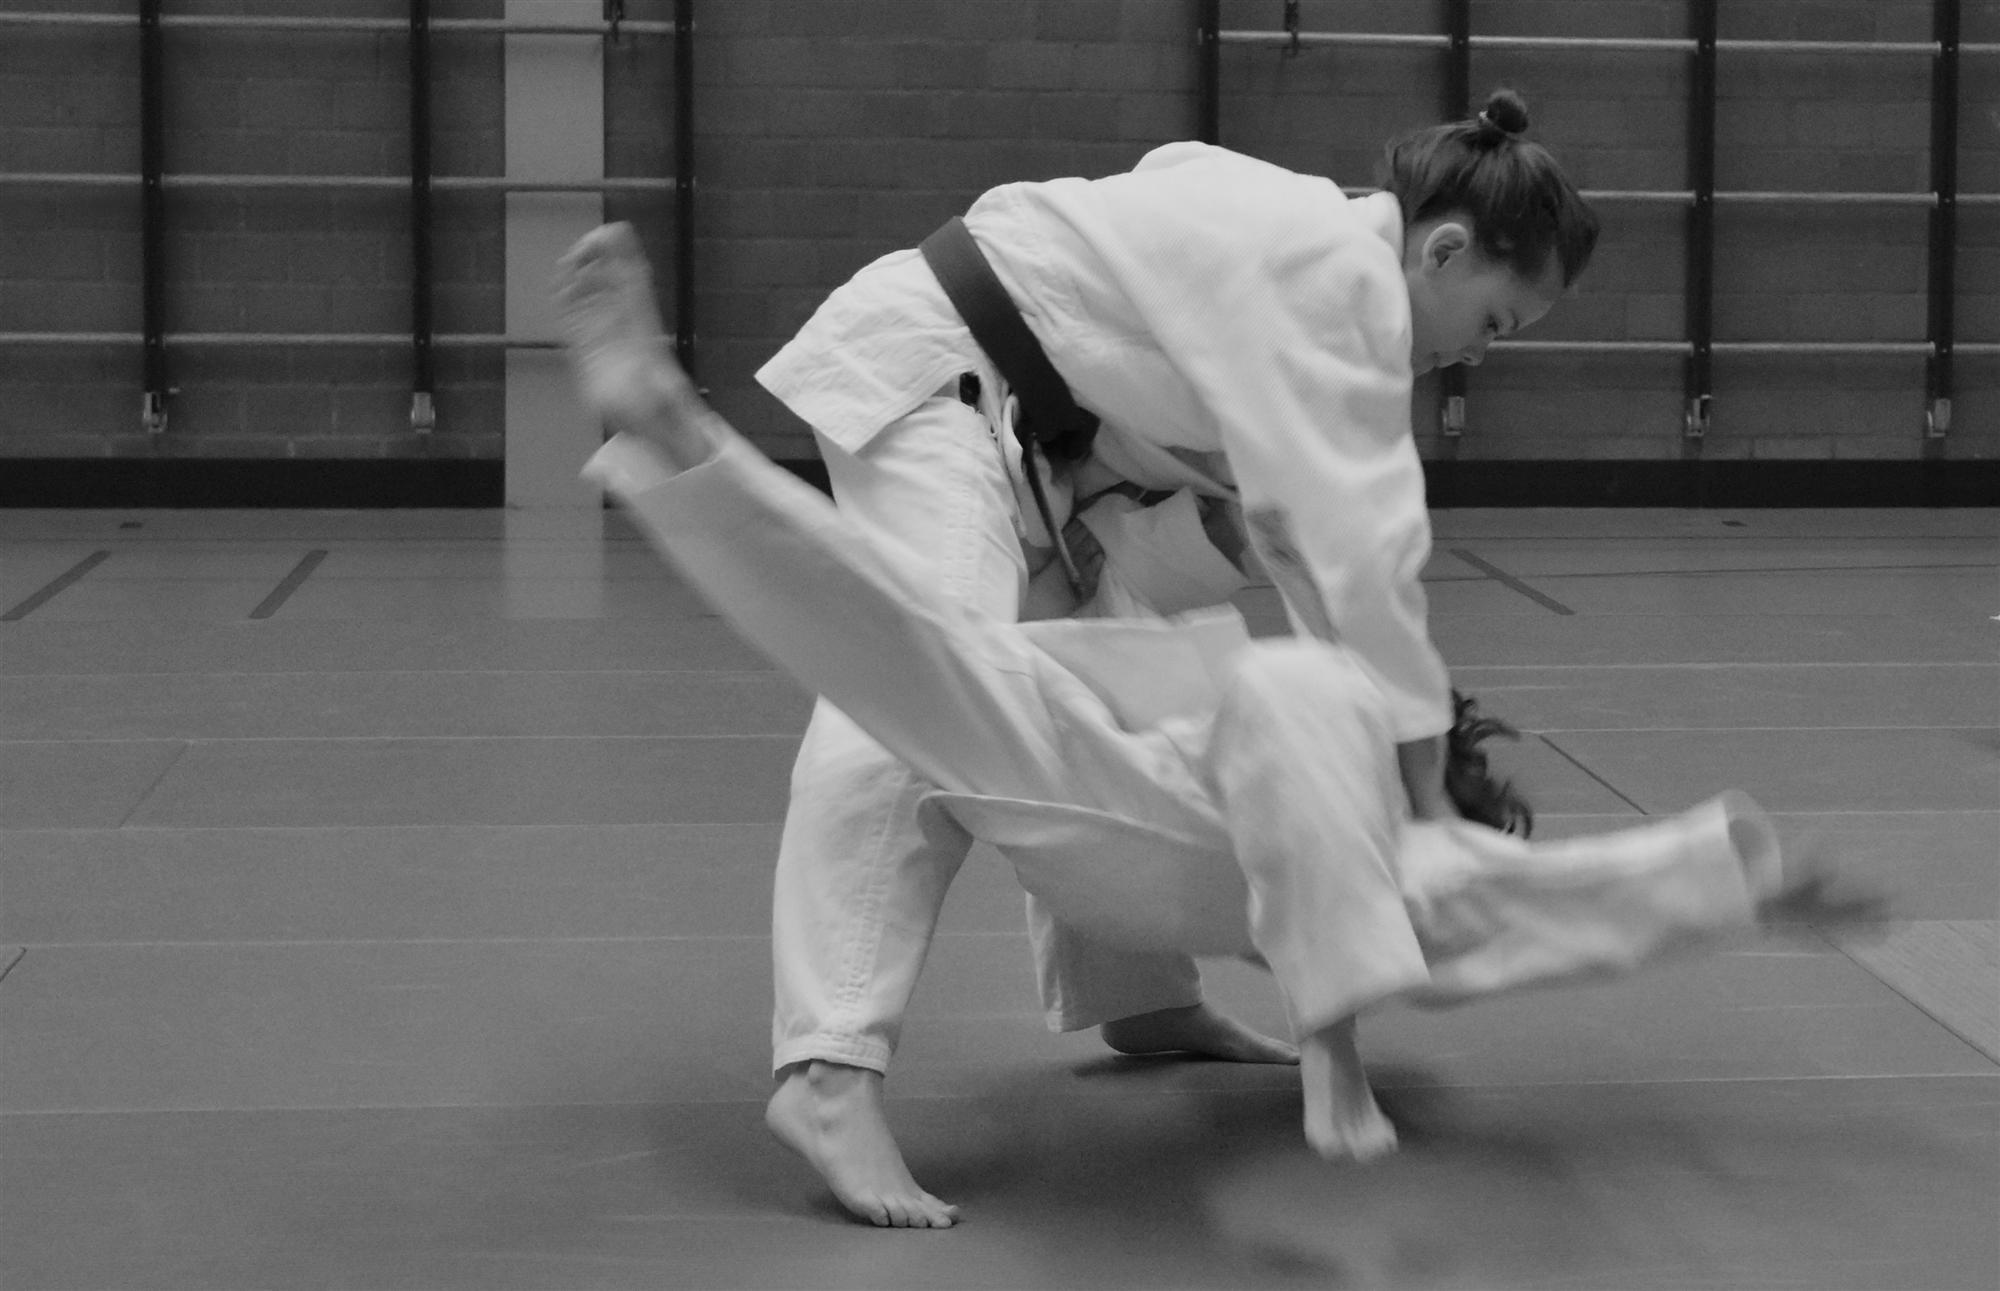 http://judoclubbrunssum.nl/iw-courses/x/